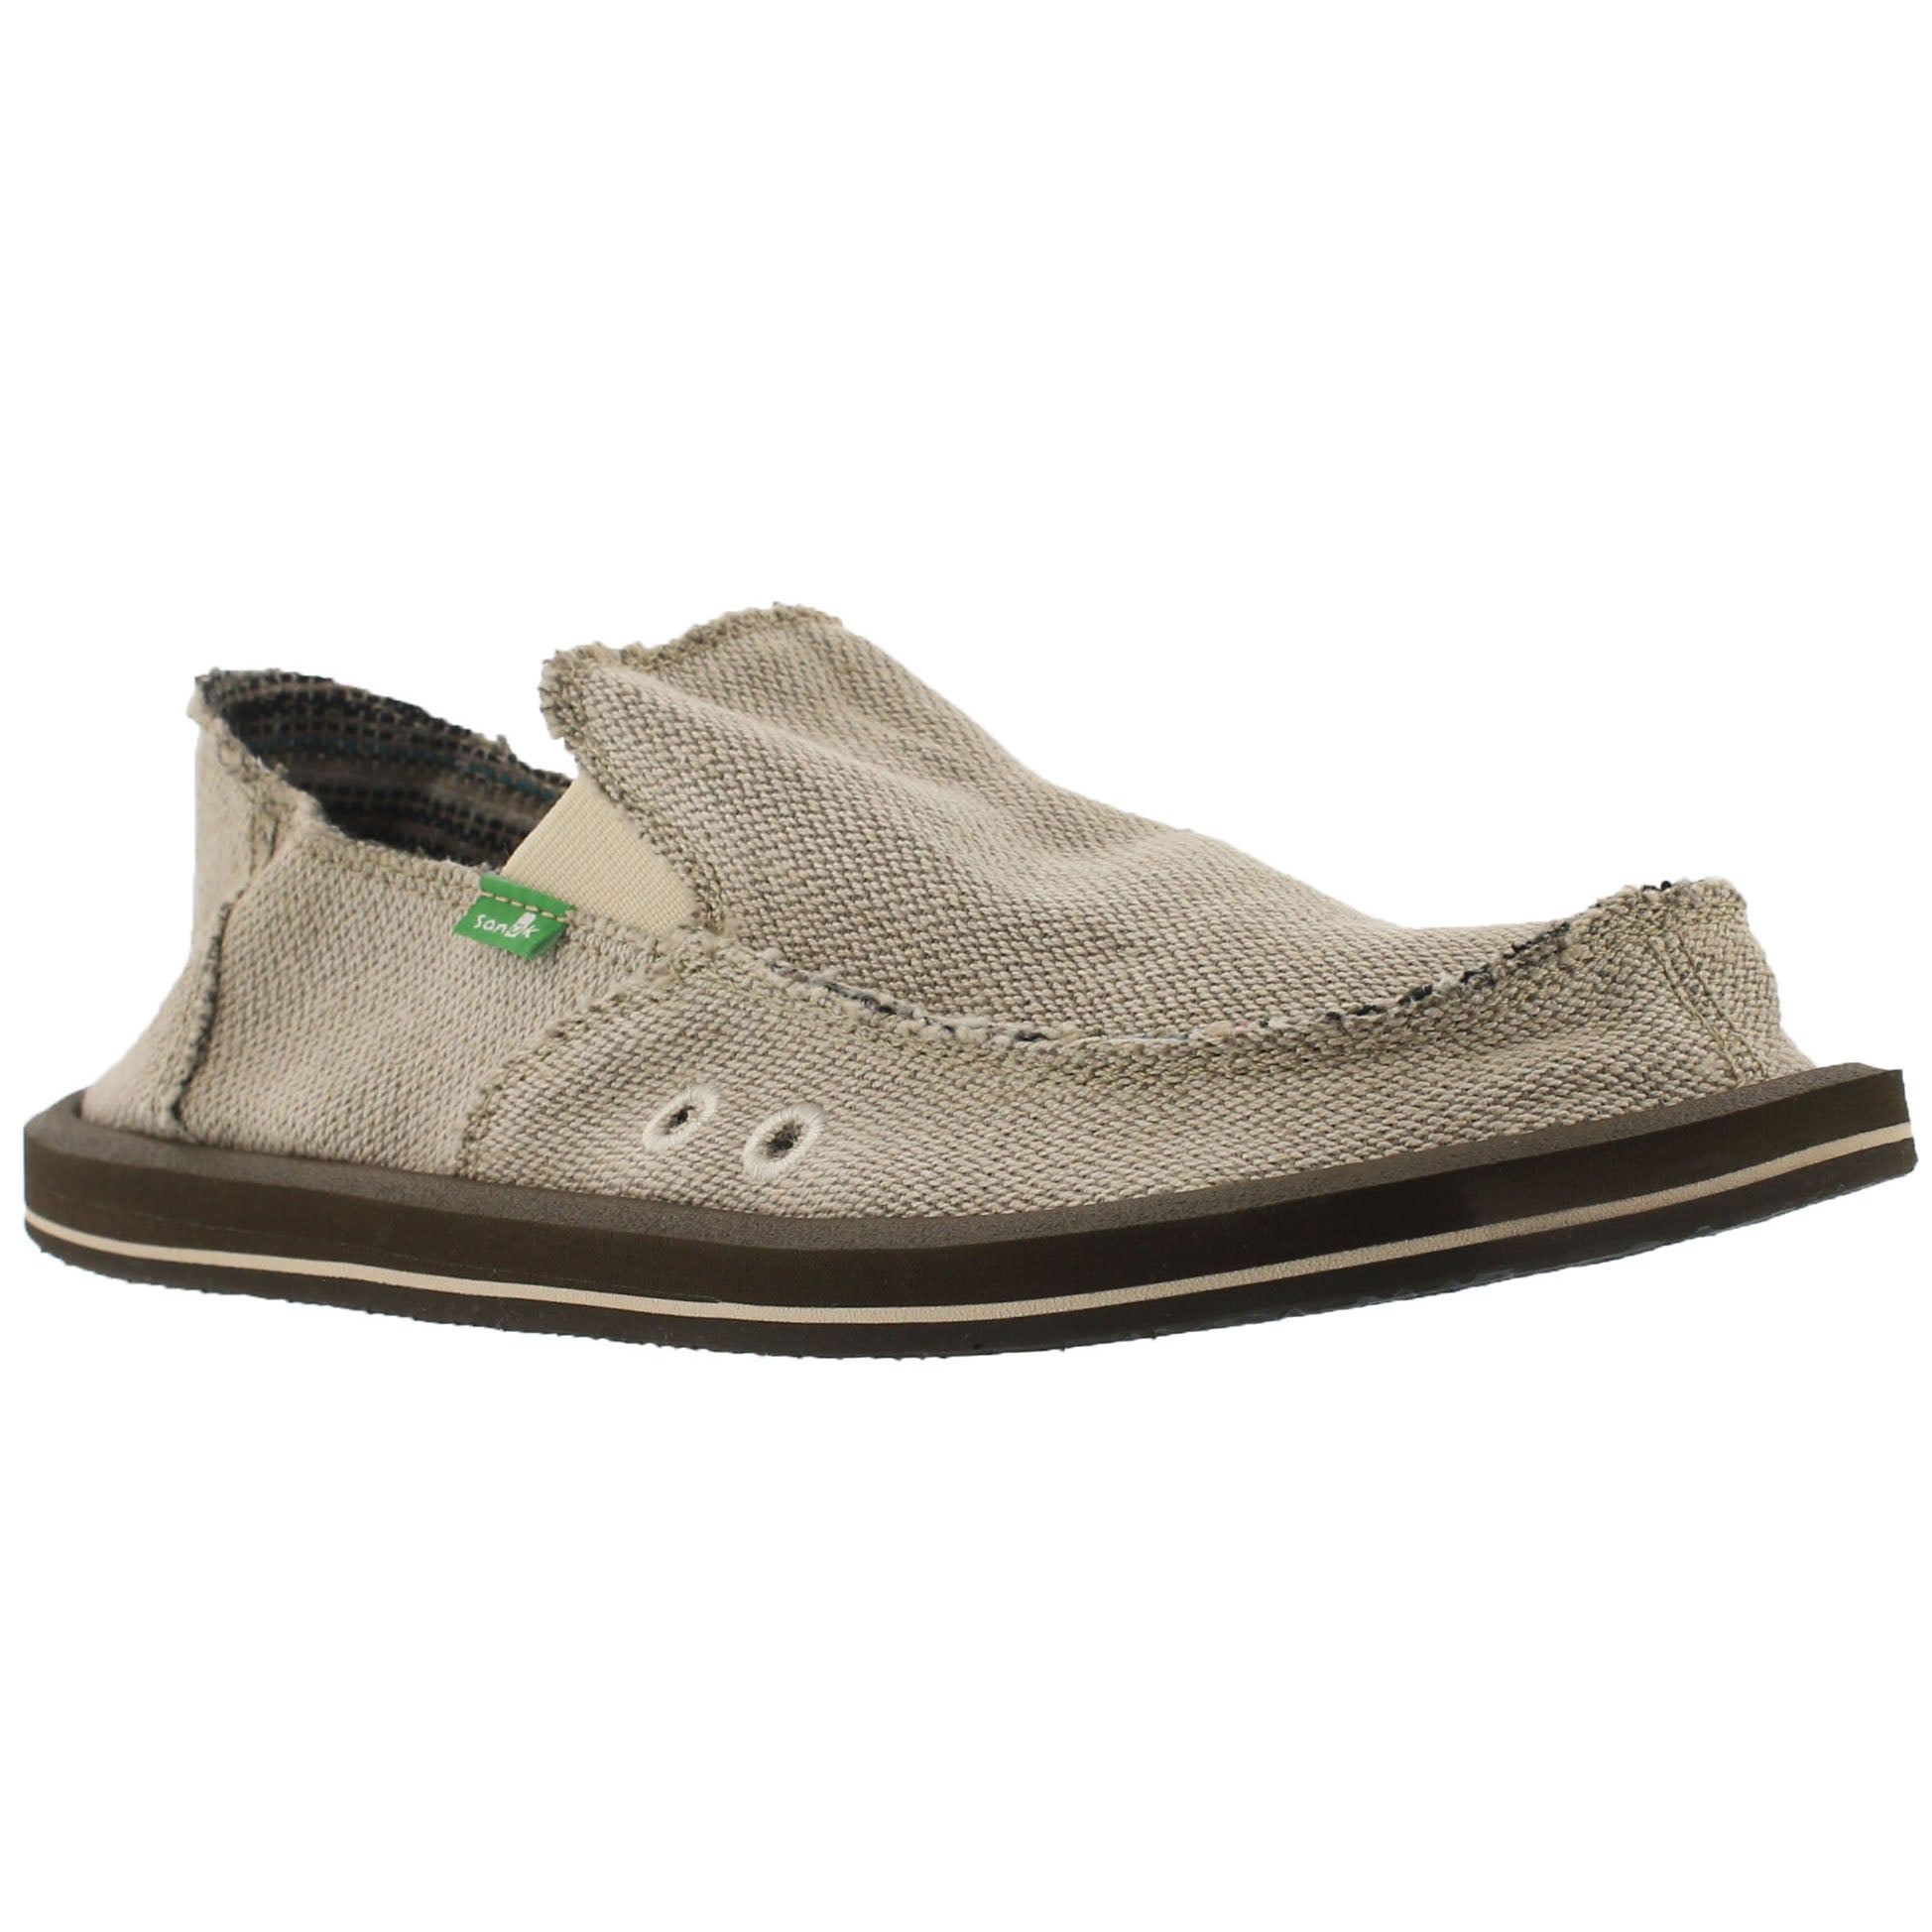 Men's HEMP natural slip on shoes